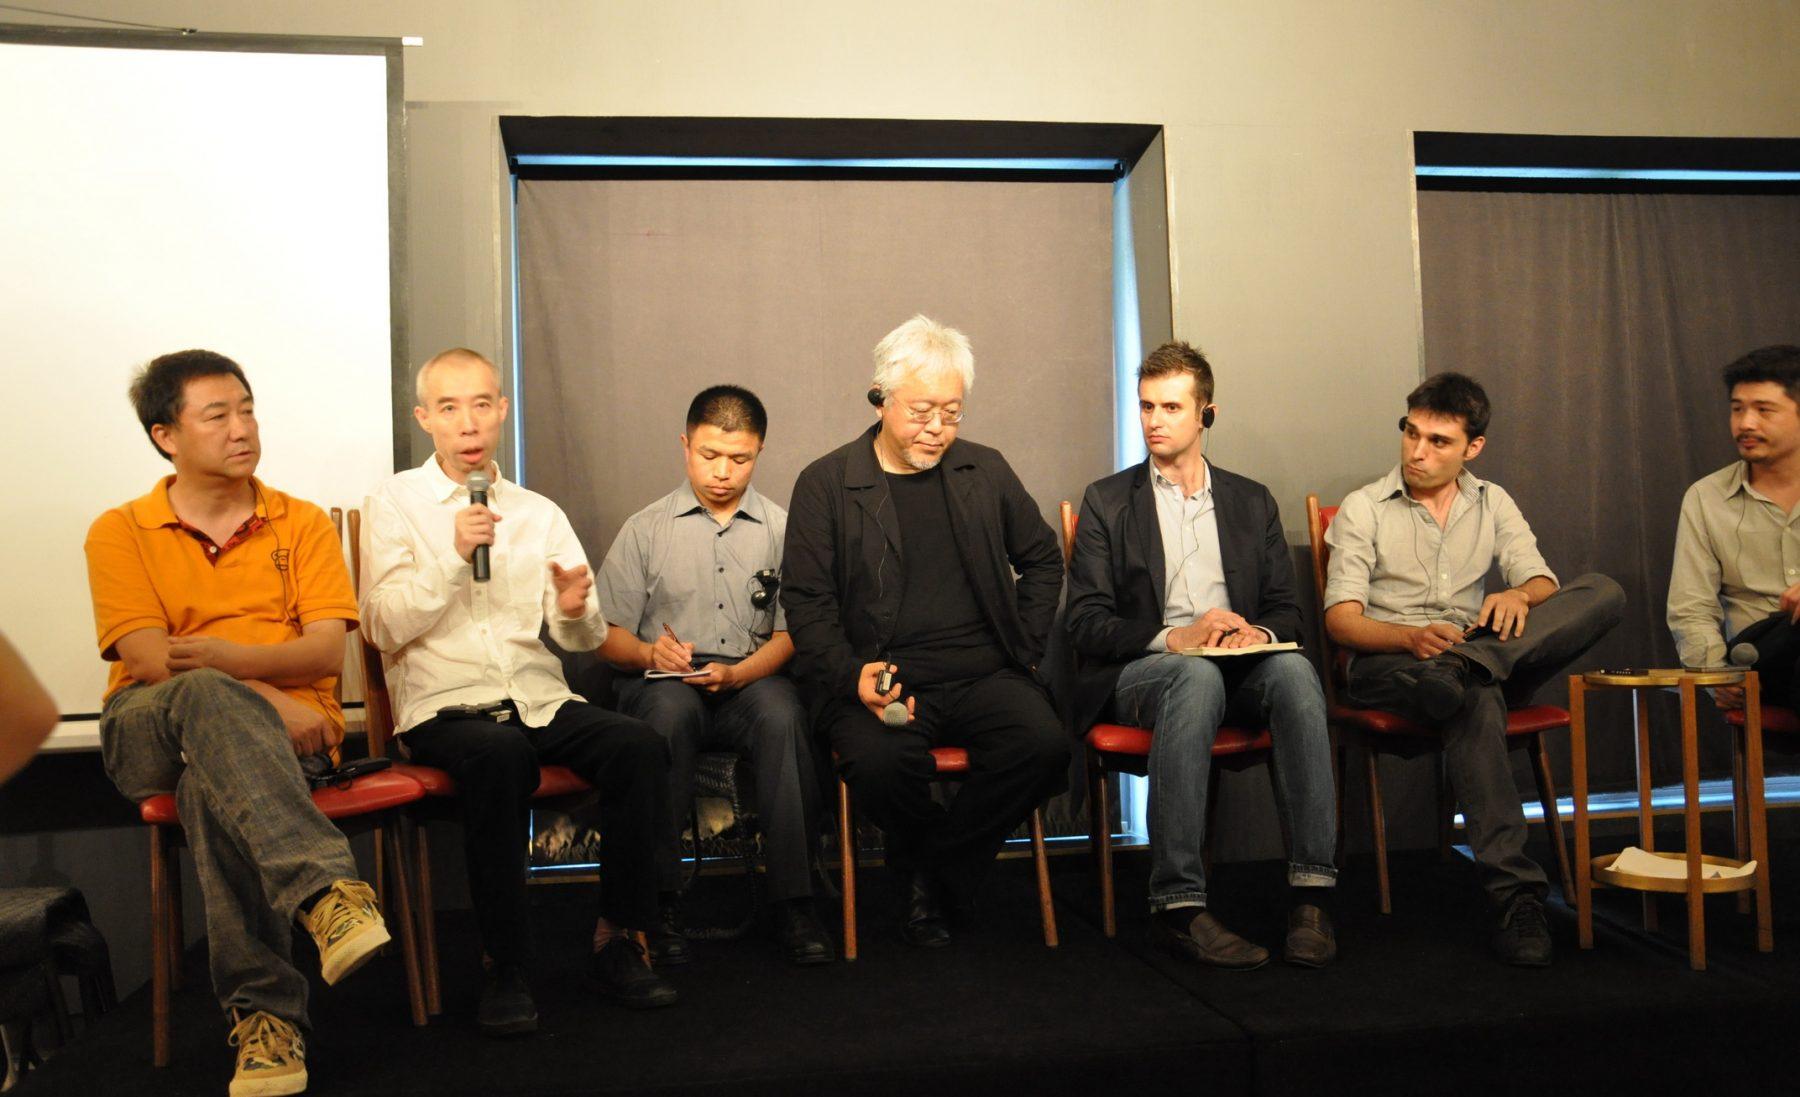 Hutopolis, Kenya Hara, Fang Zhenning, Luis Aguire Manso, Liang Jingyu, Giannantonio Bongiorno,